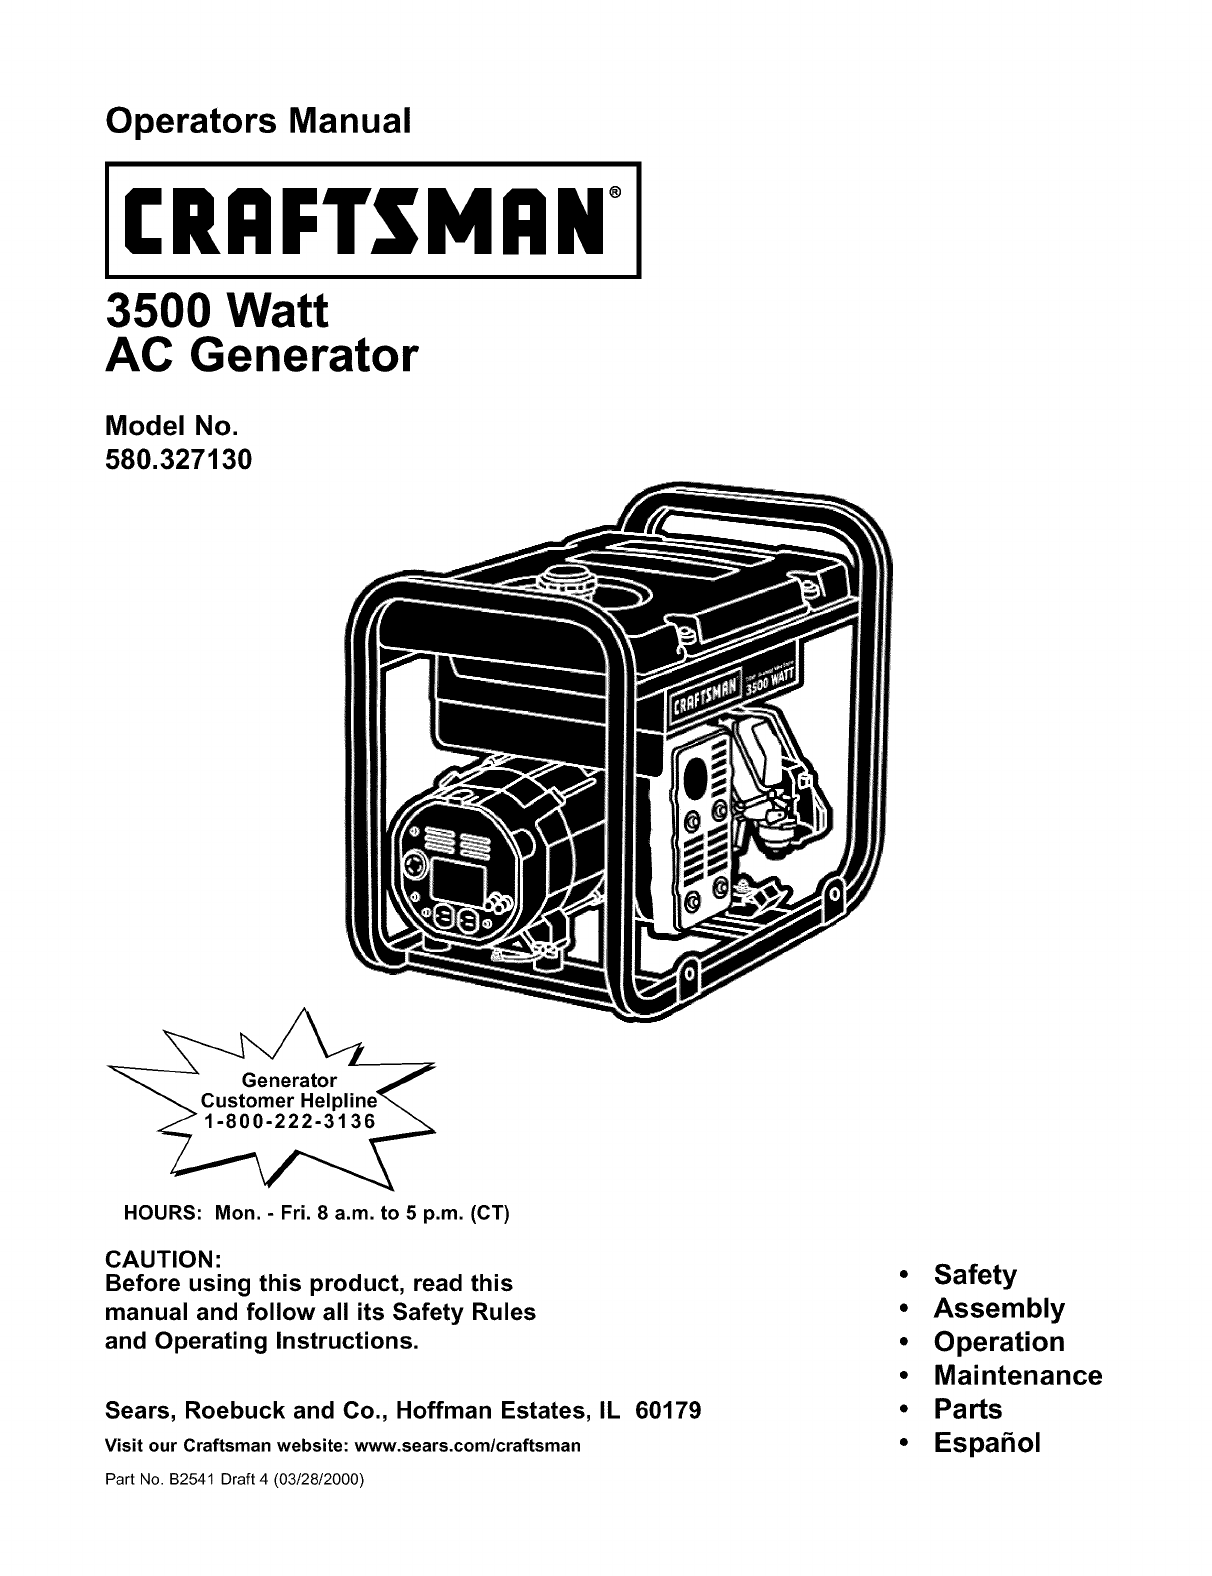 Craftsman User Manual Watt A C Generator